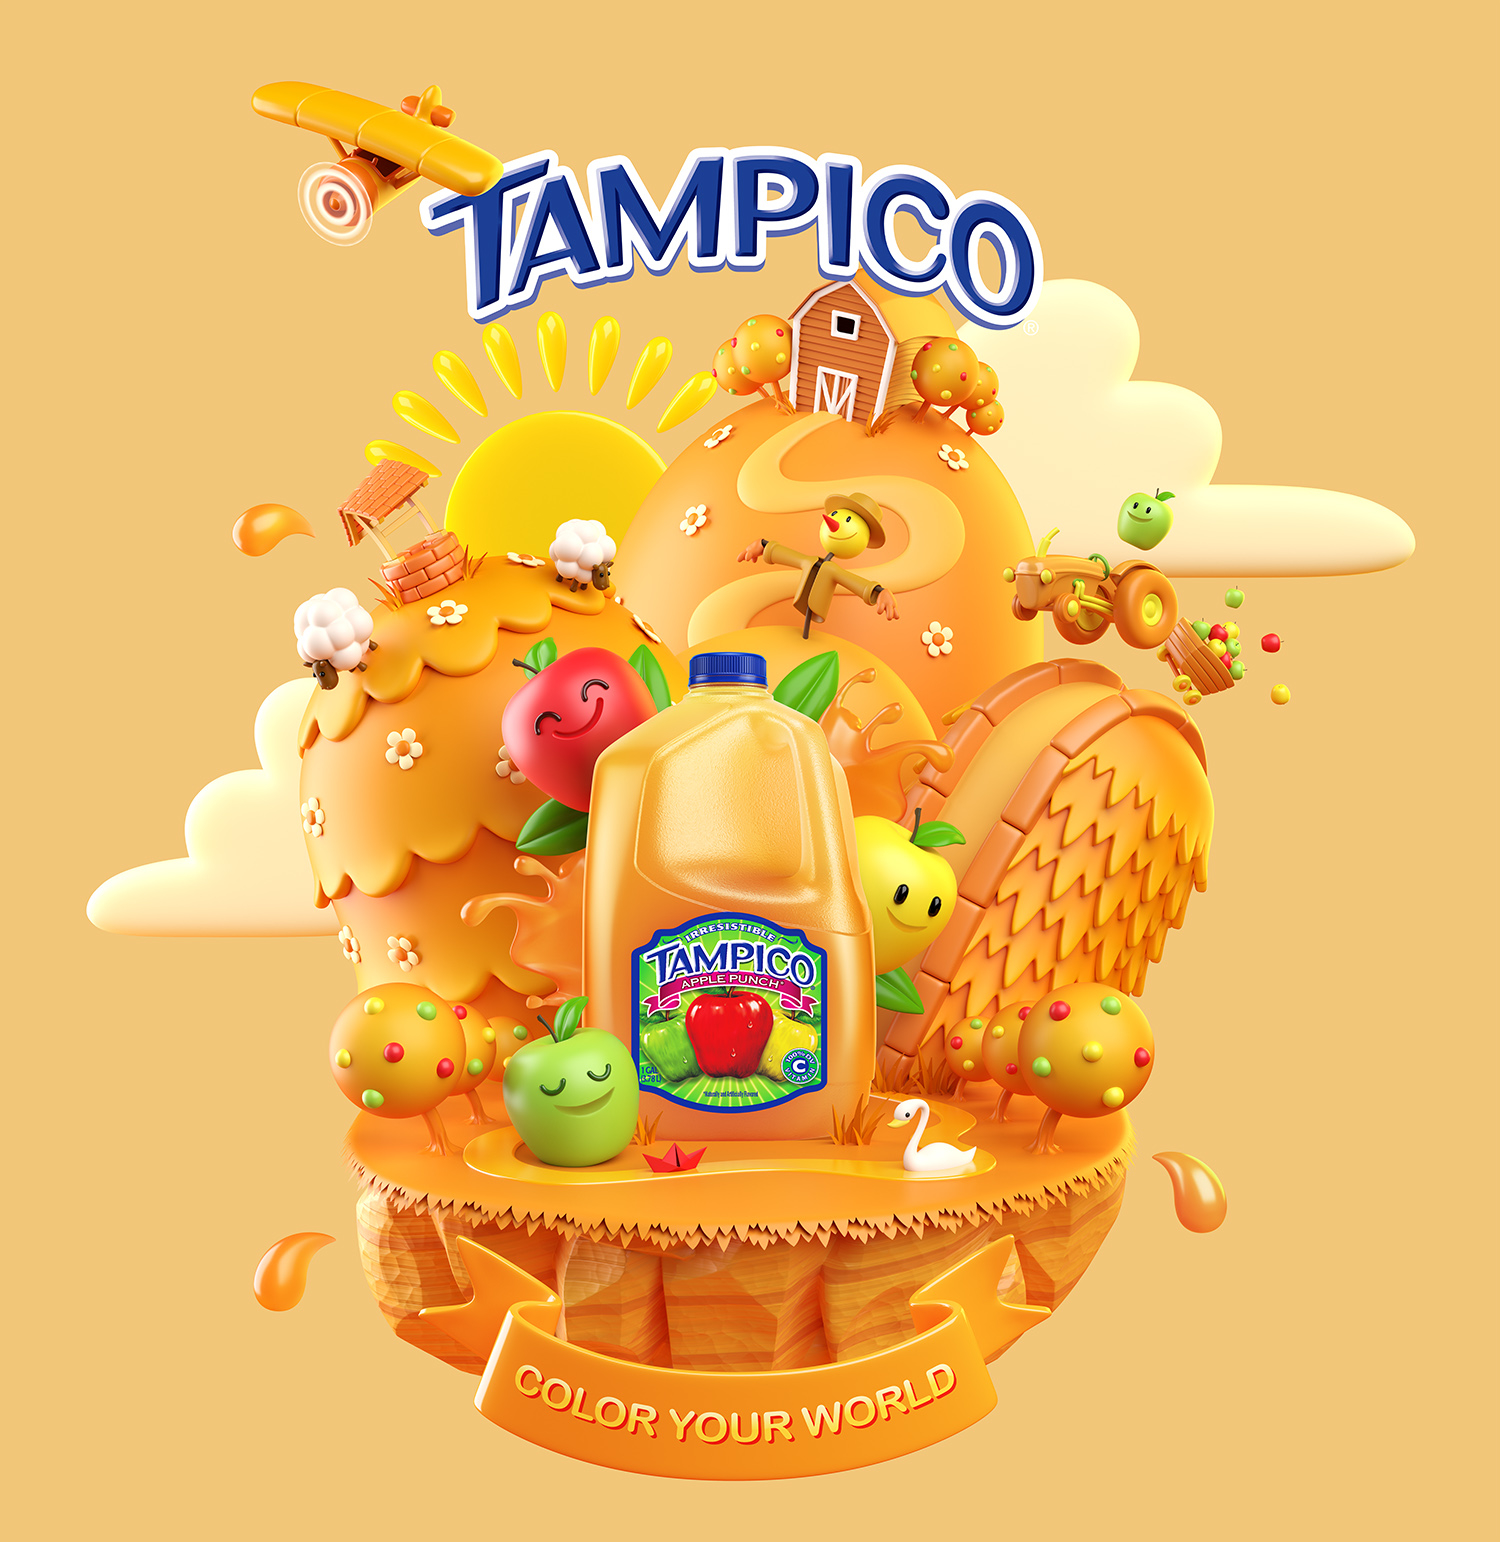 Tampico_CYW_Apple_1500.jpg